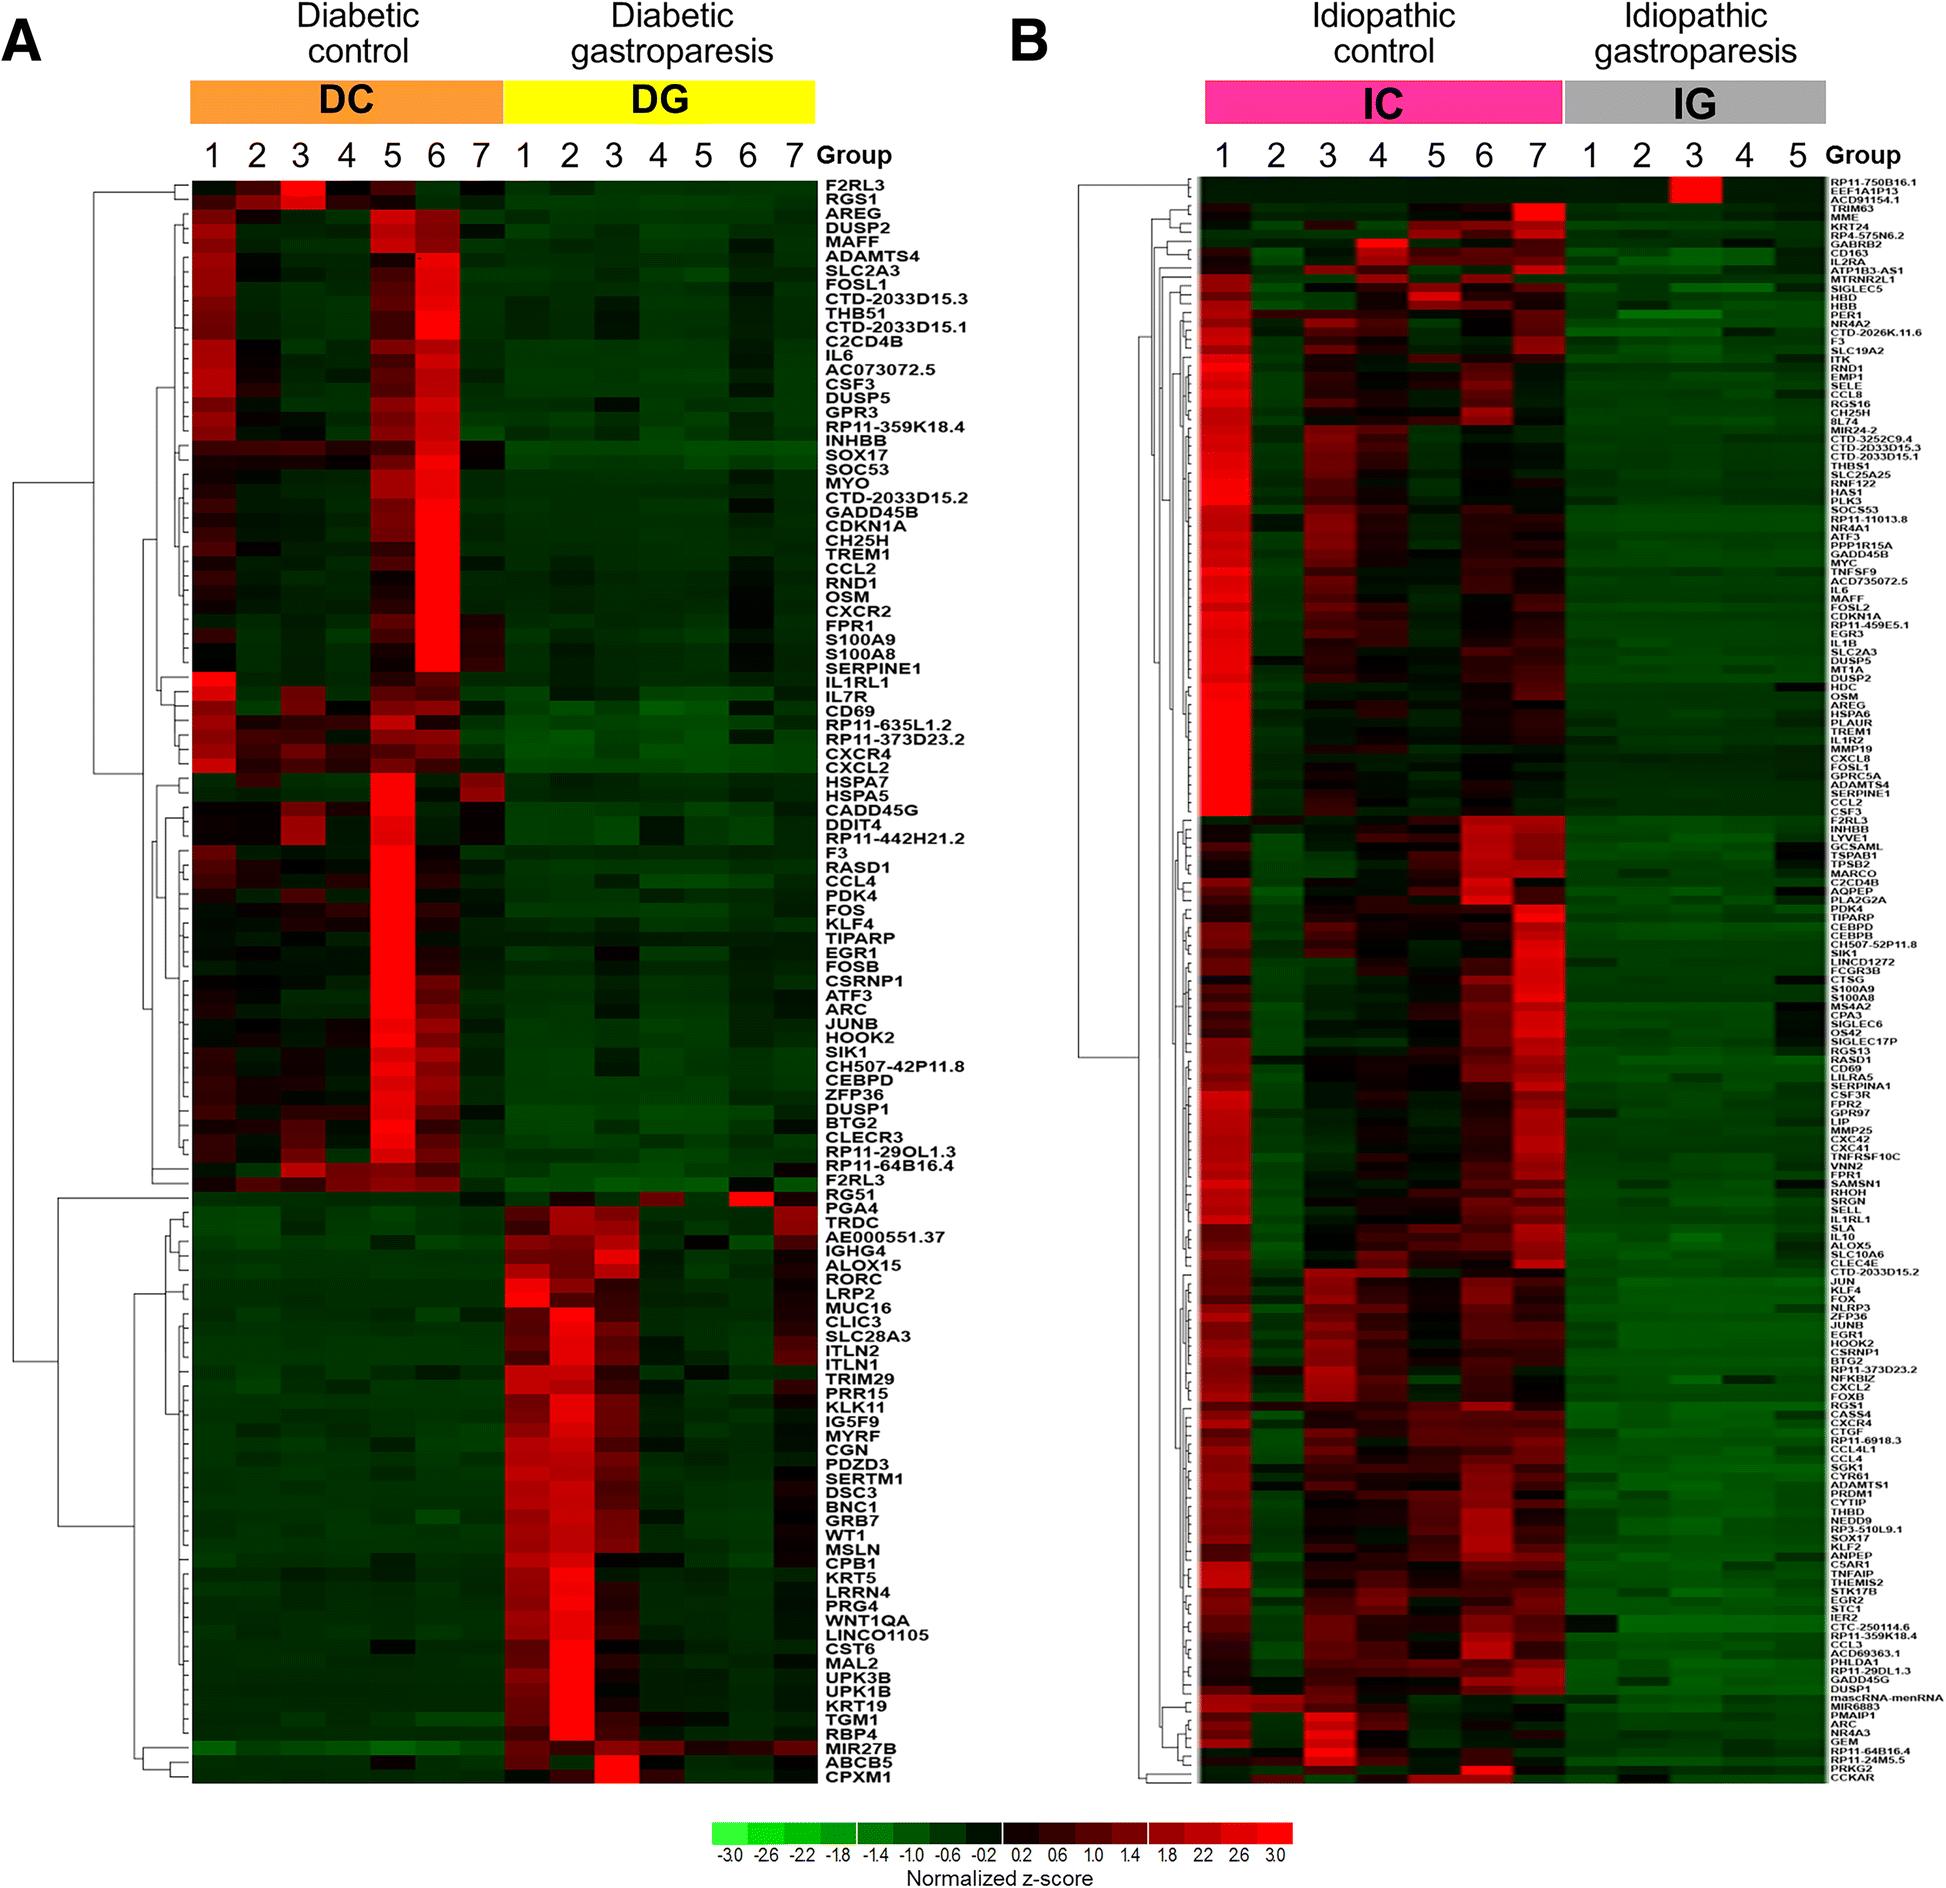 Transcriptomic signatures reveal immune dysregulation in human